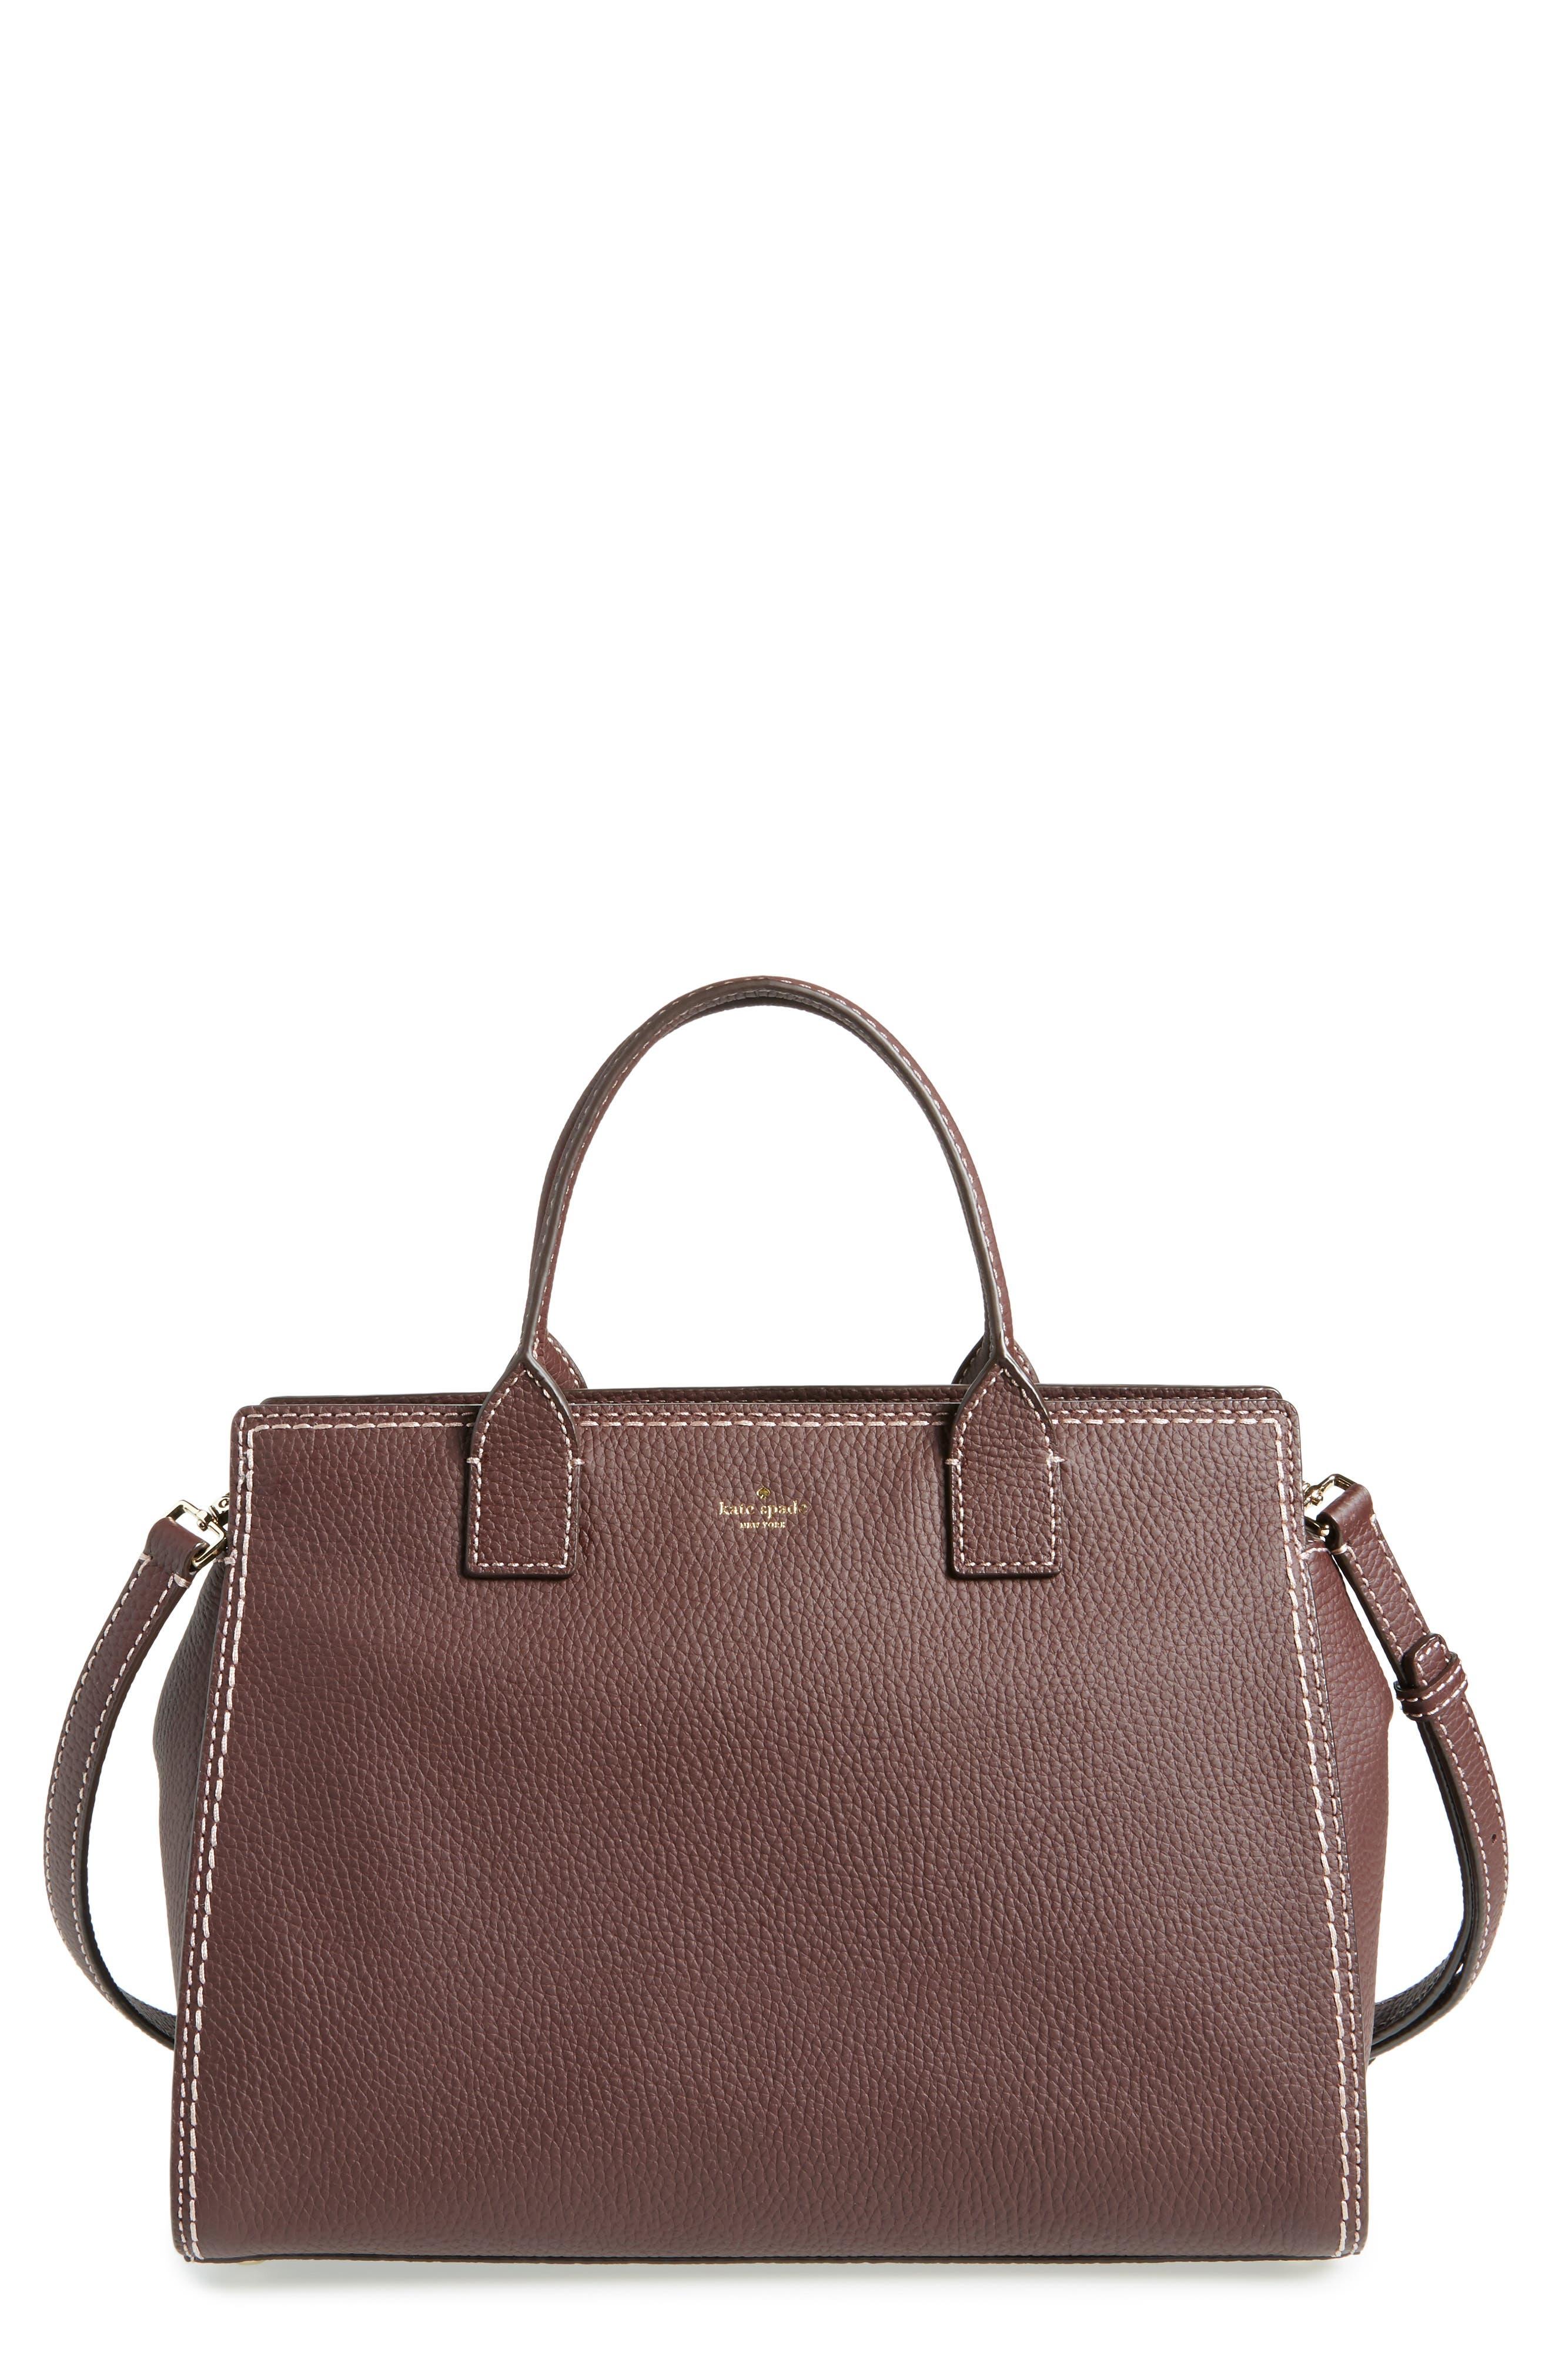 kate spade new york dunne lane lake leather satchel